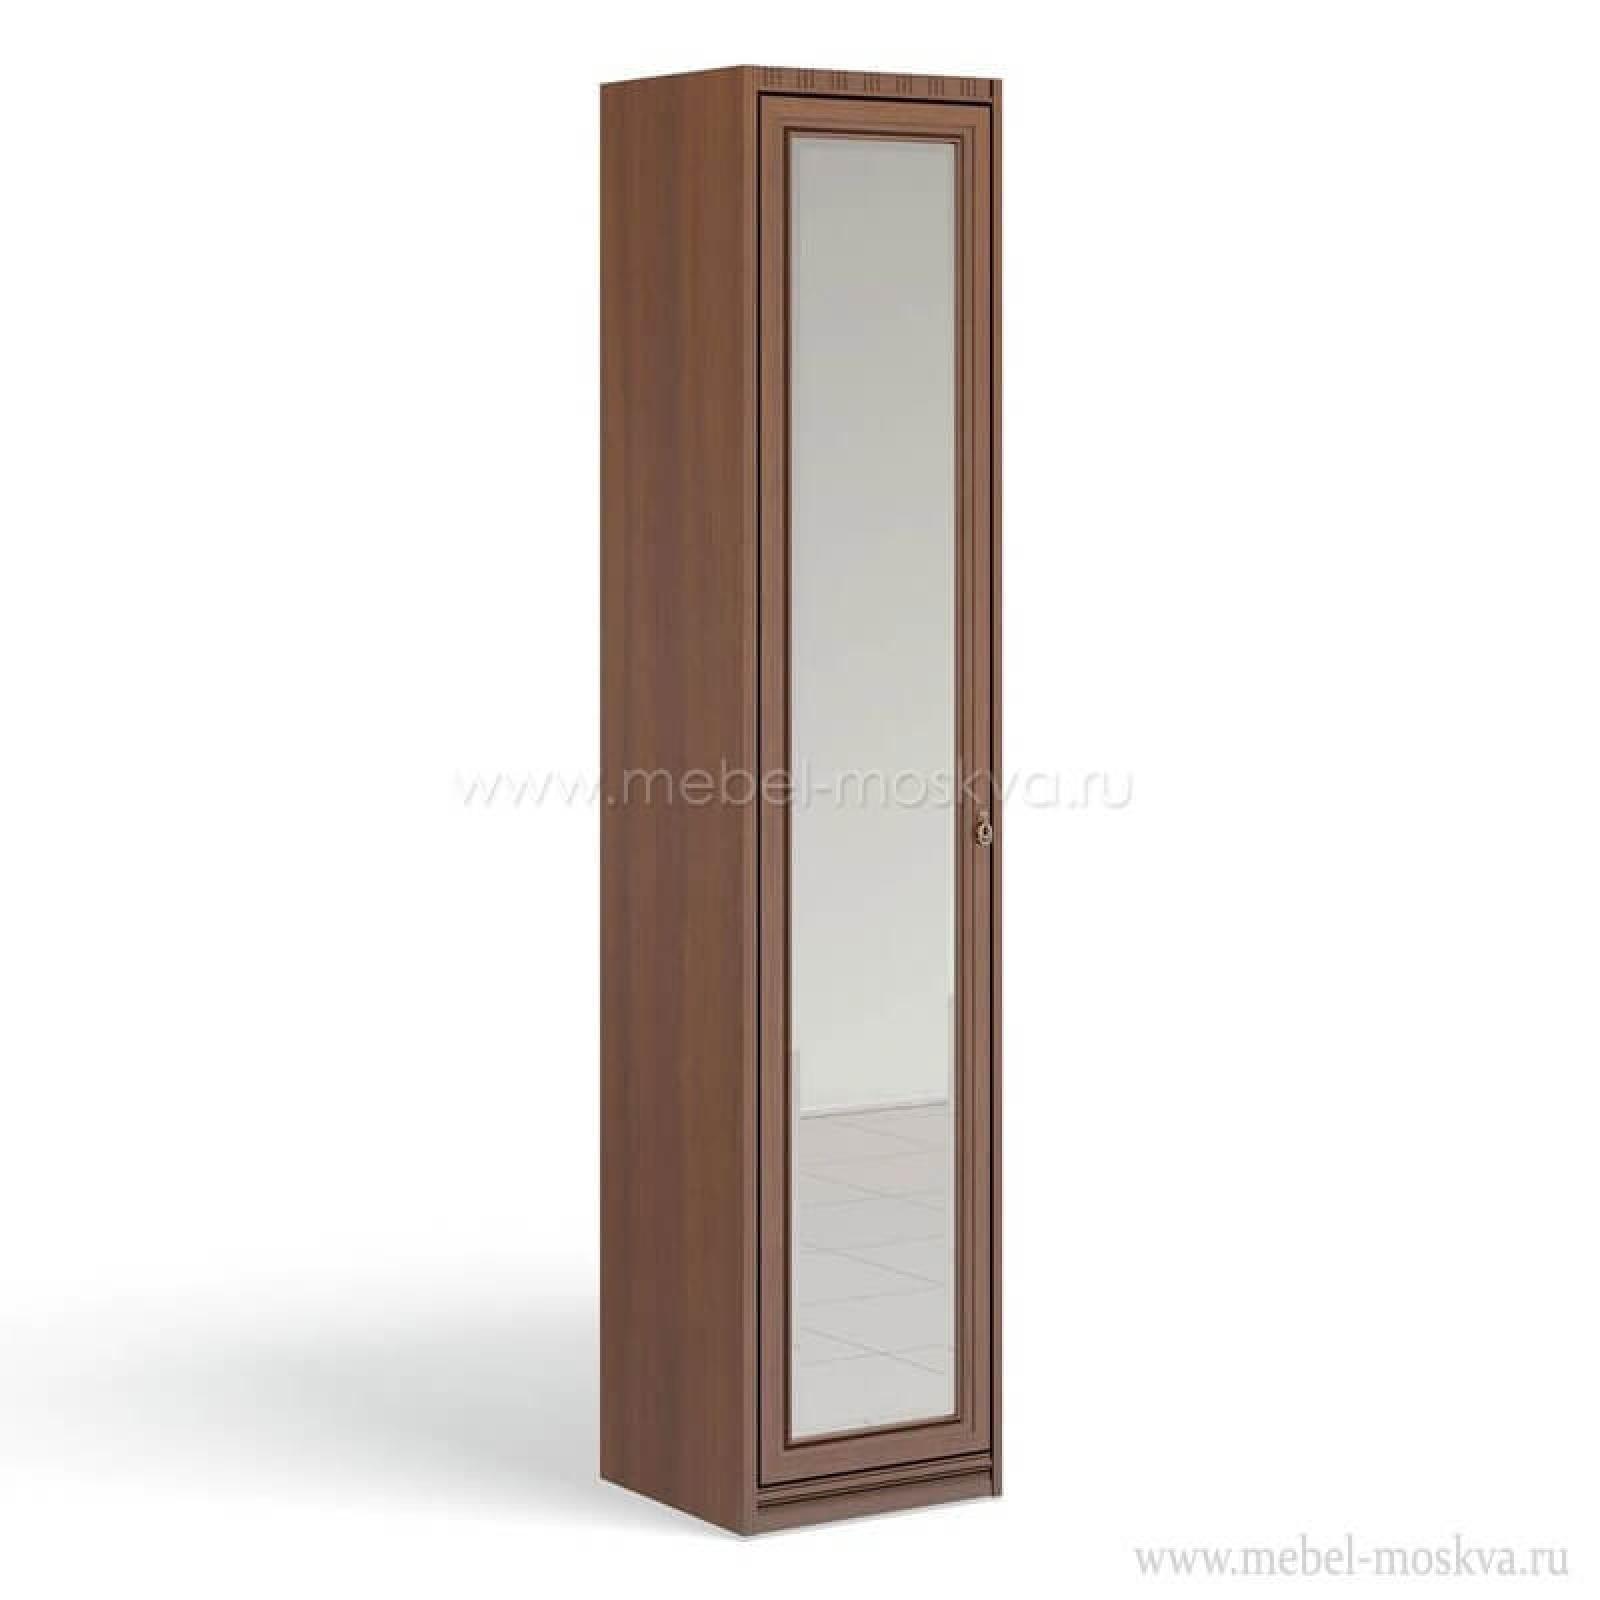 """Рапсодия Ю"" Ю354.11Z Колонка для белья c зеркалом - 1"